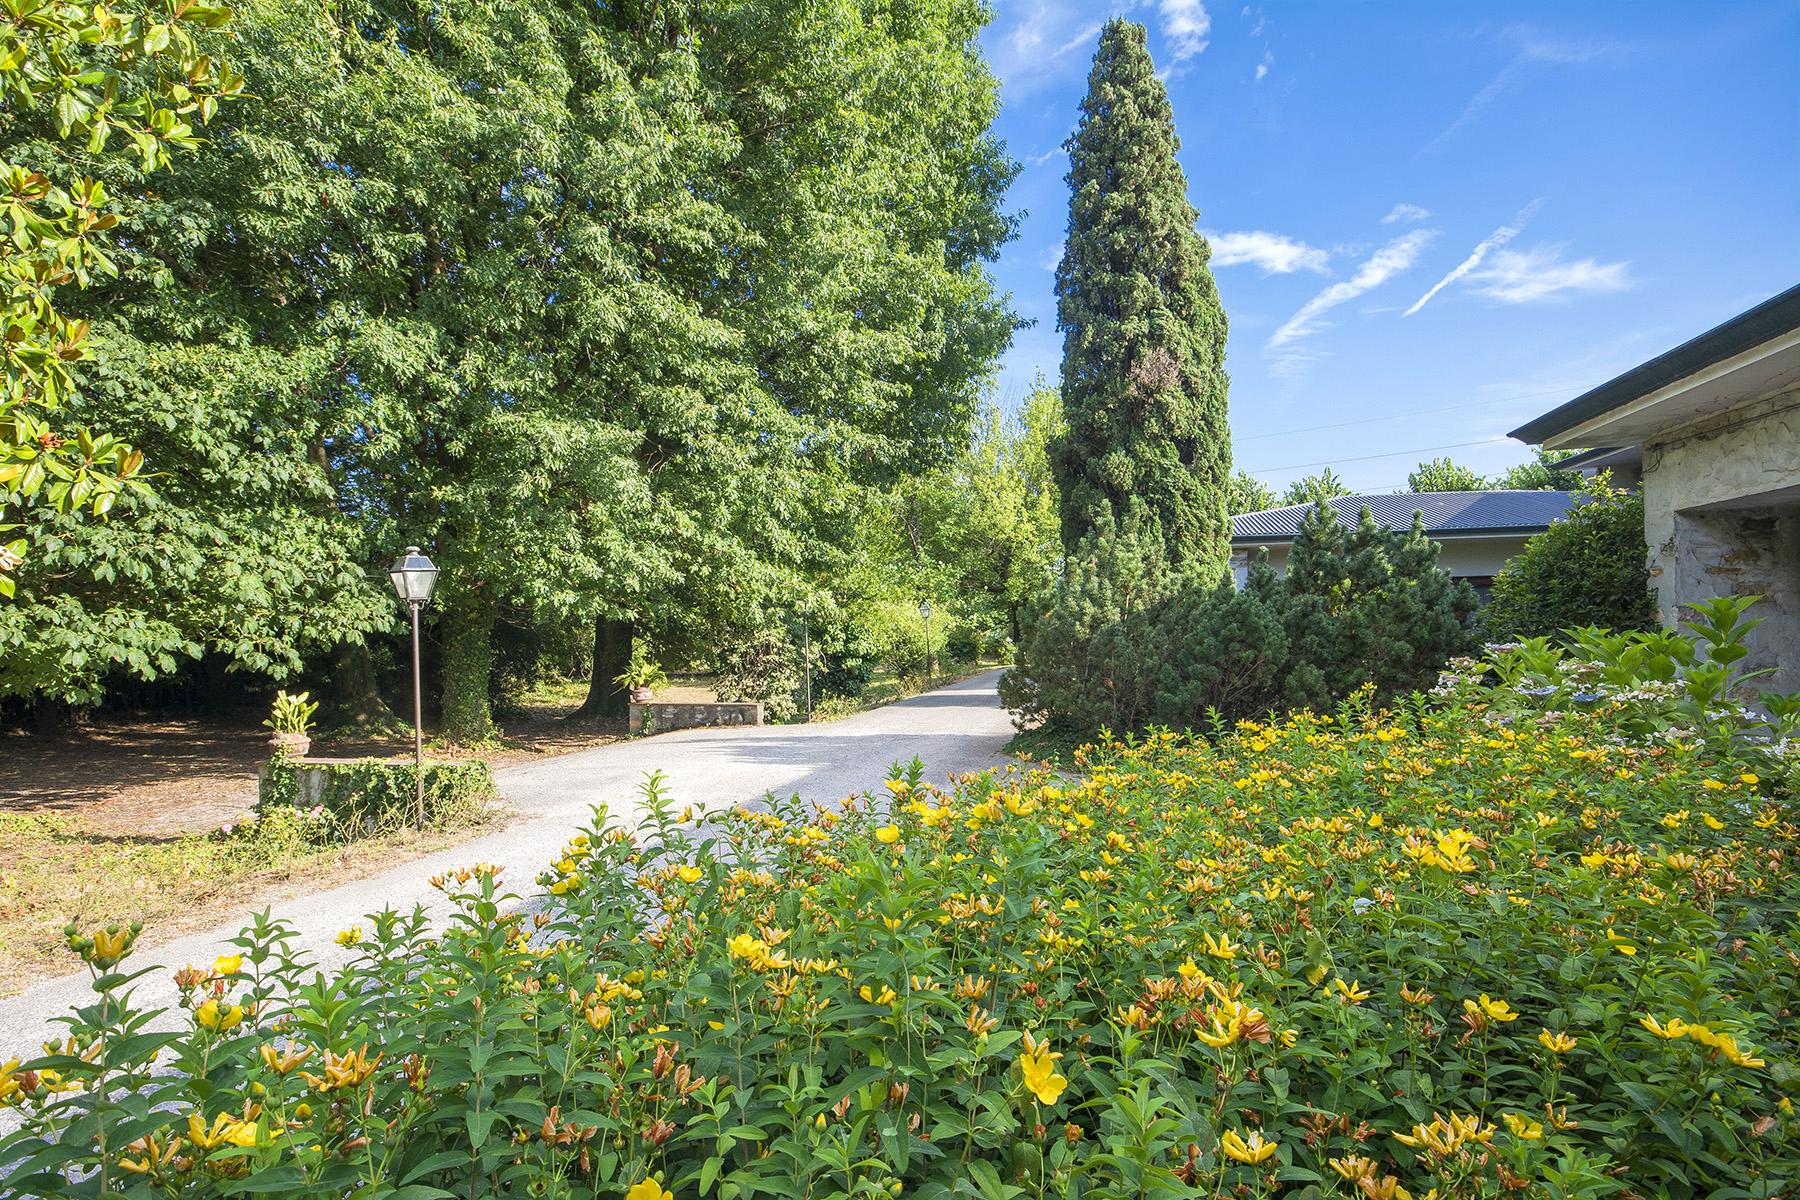 Villa in Vendita a Capannori: 5 locali, 500 mq - Foto 4